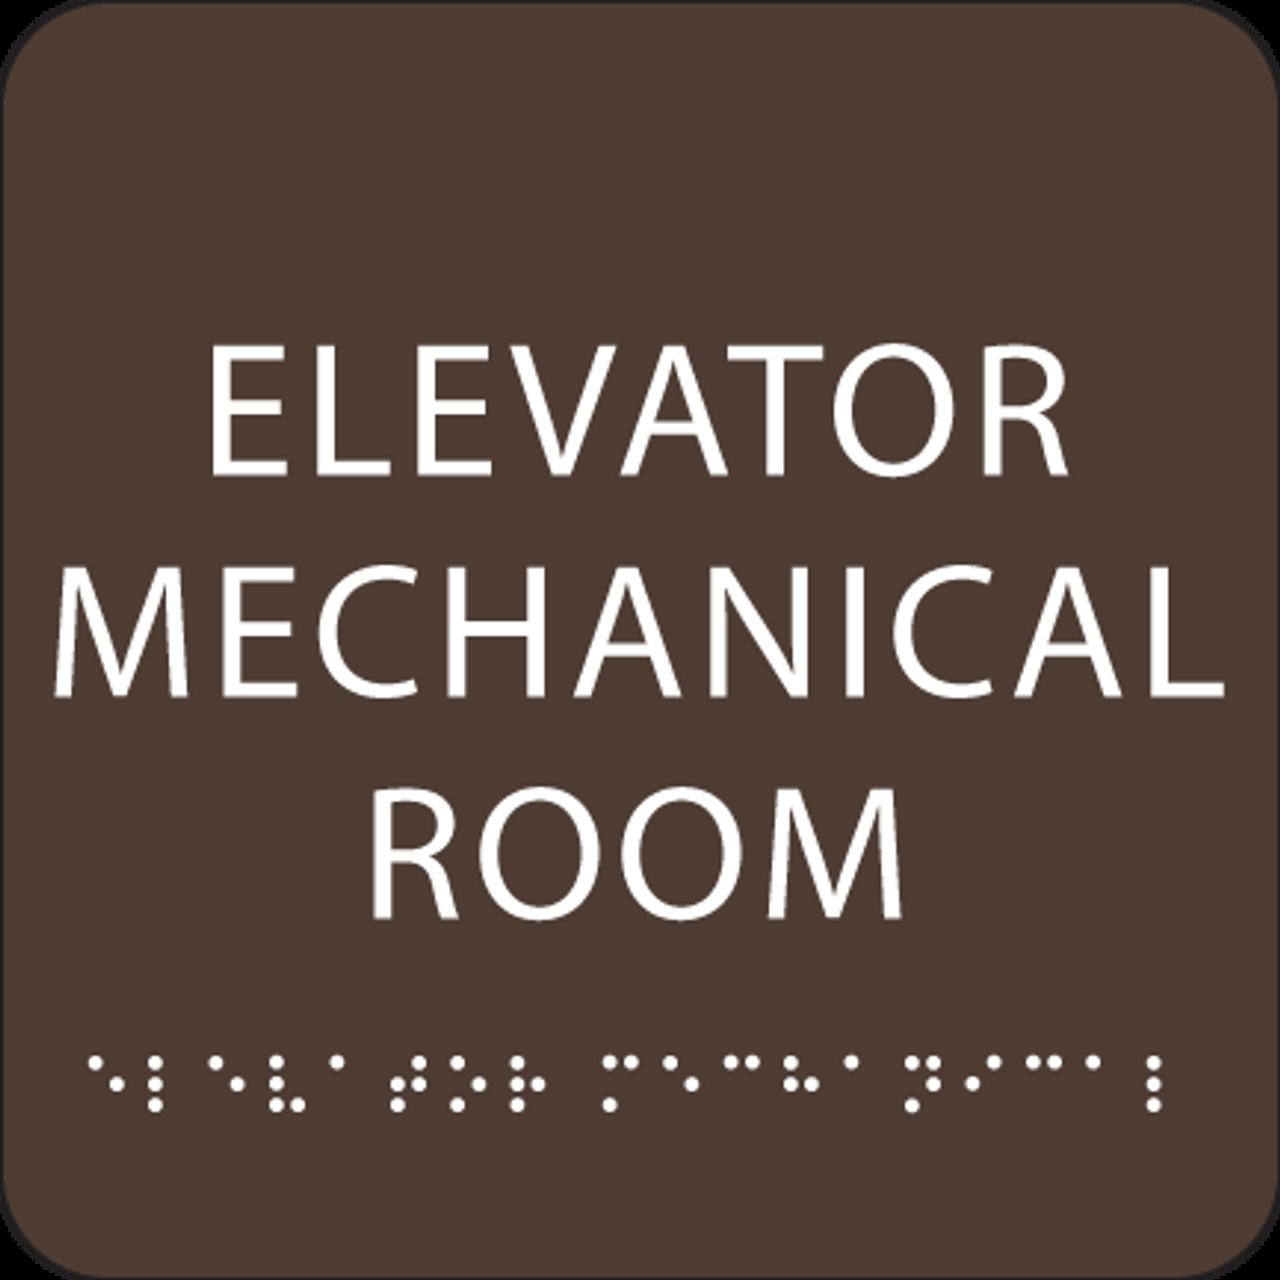 Dark Brown Elevator Mechanical Room ADA Sign